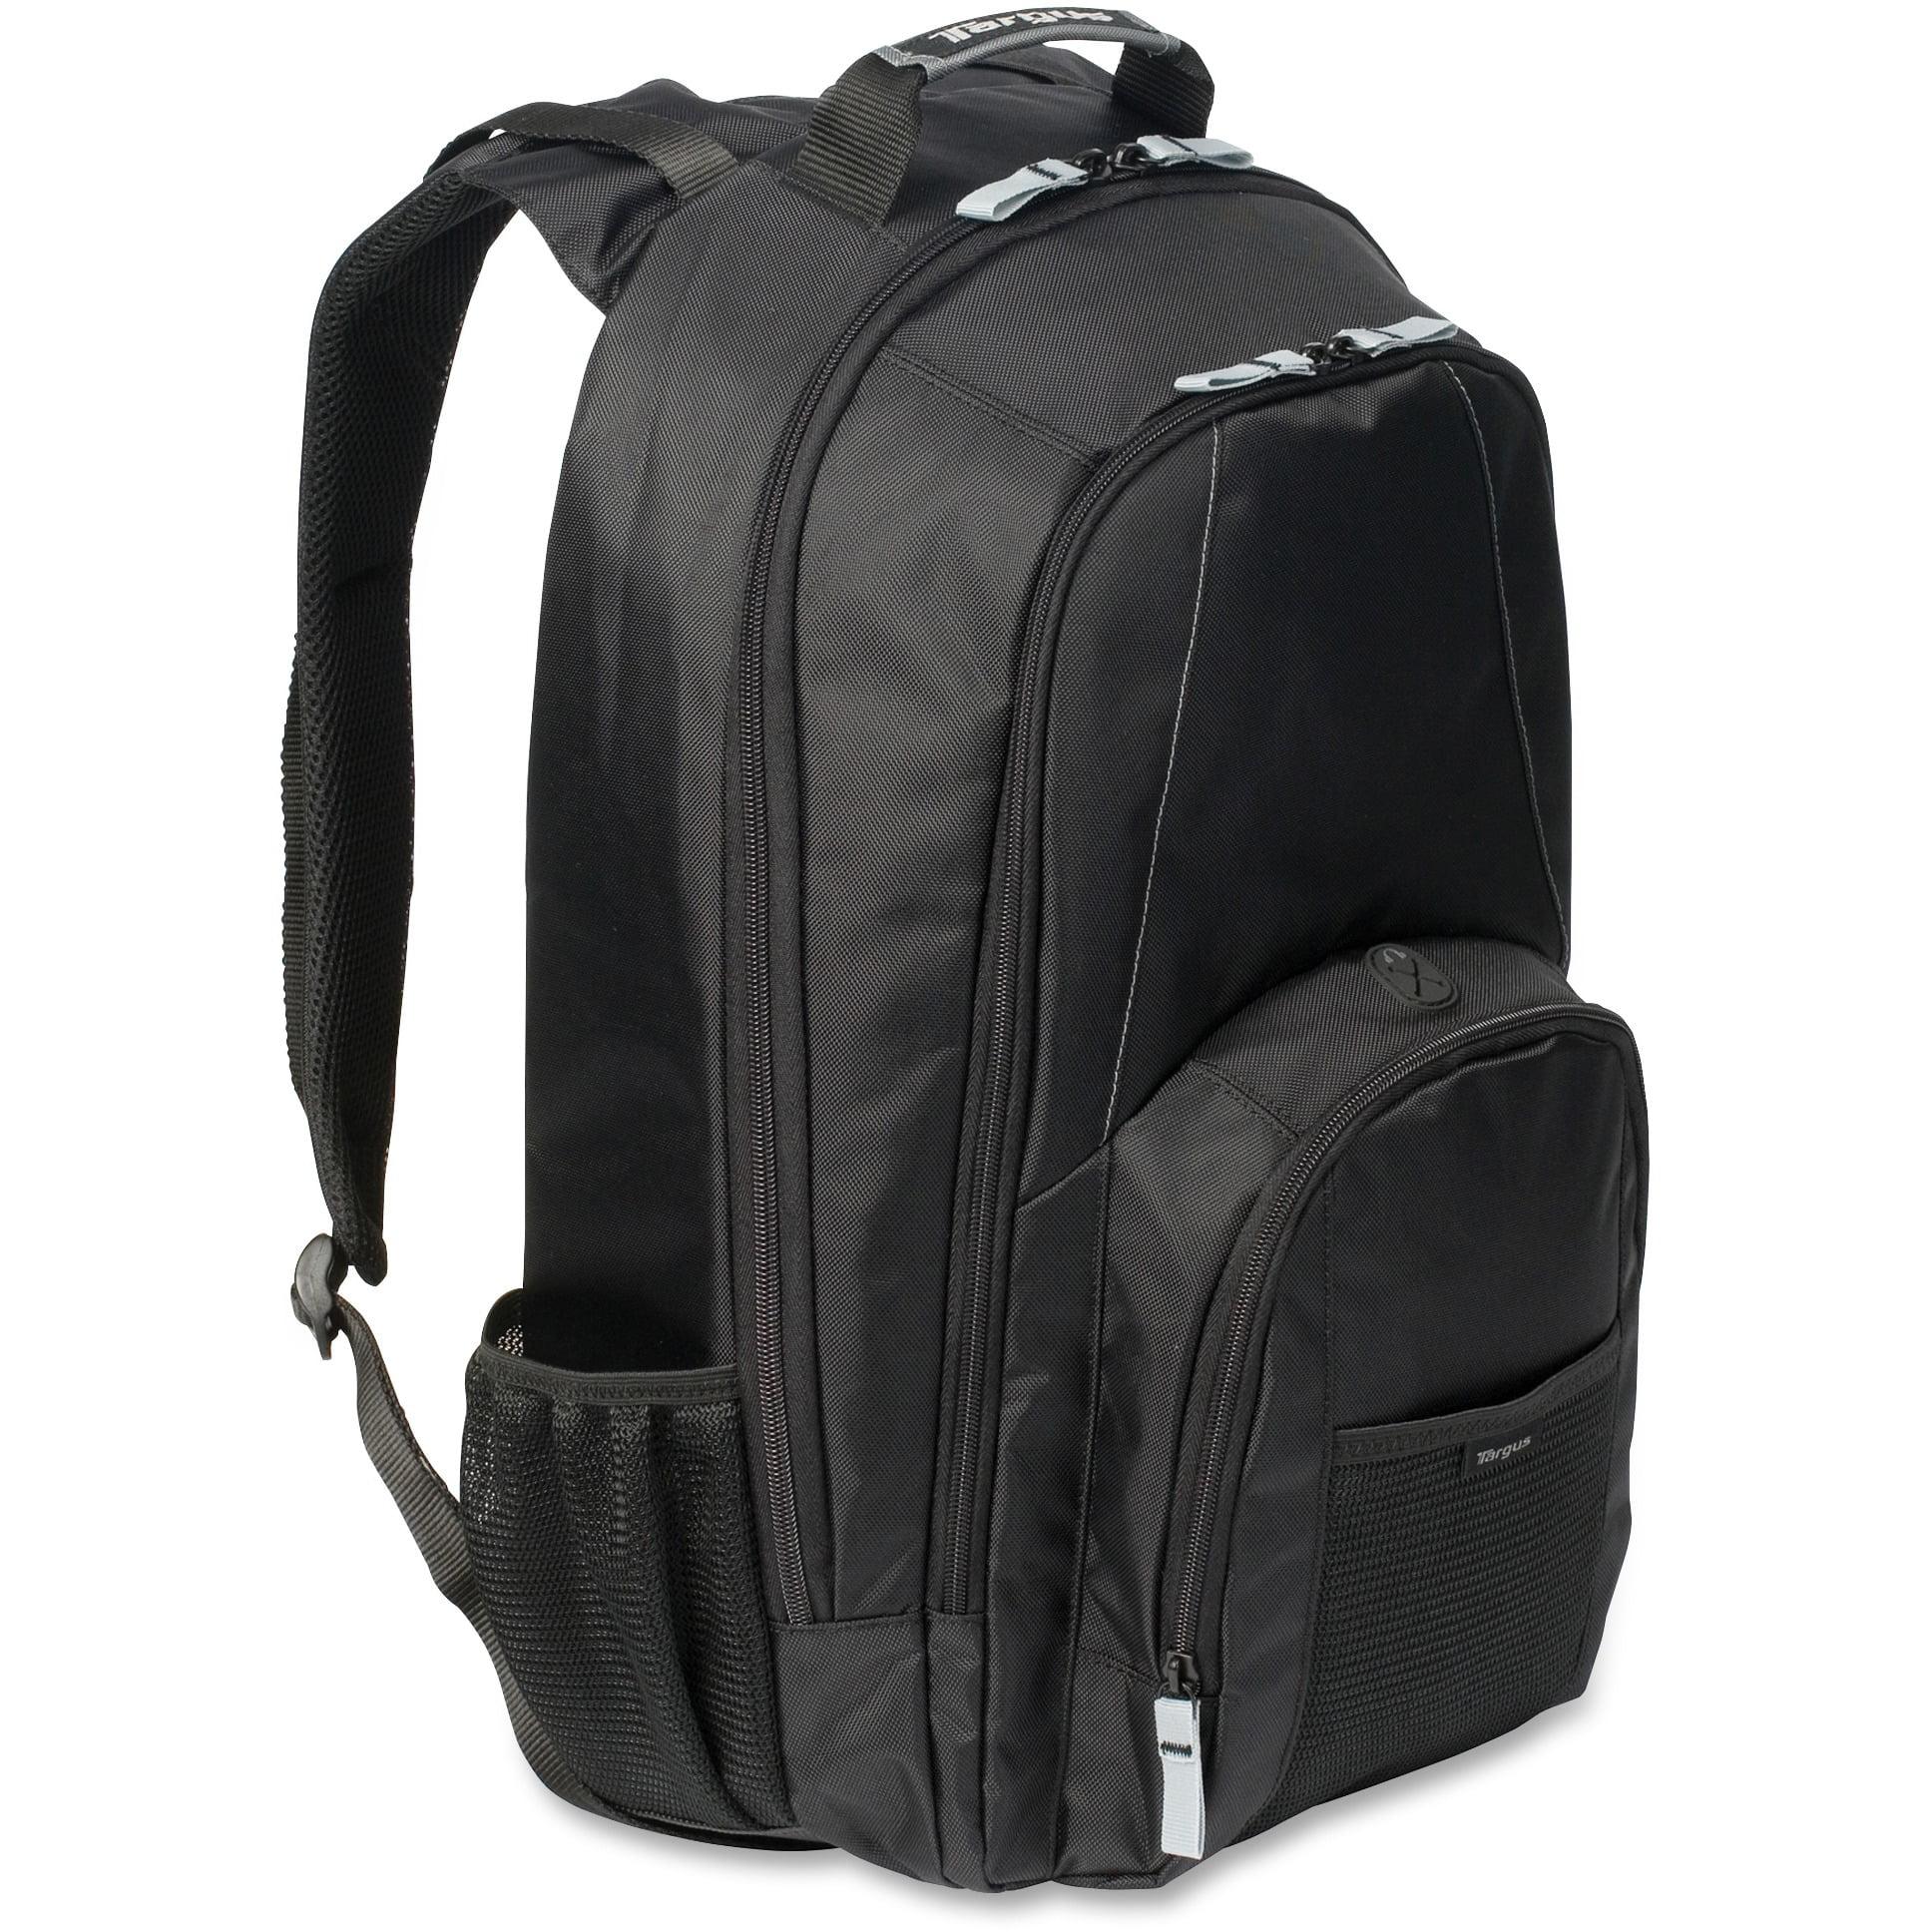 "Targus Groove CVR617 Carrying Case (Backpack) for 17"" Notebook, Pen, Bottle, Books, Accessories - Black"